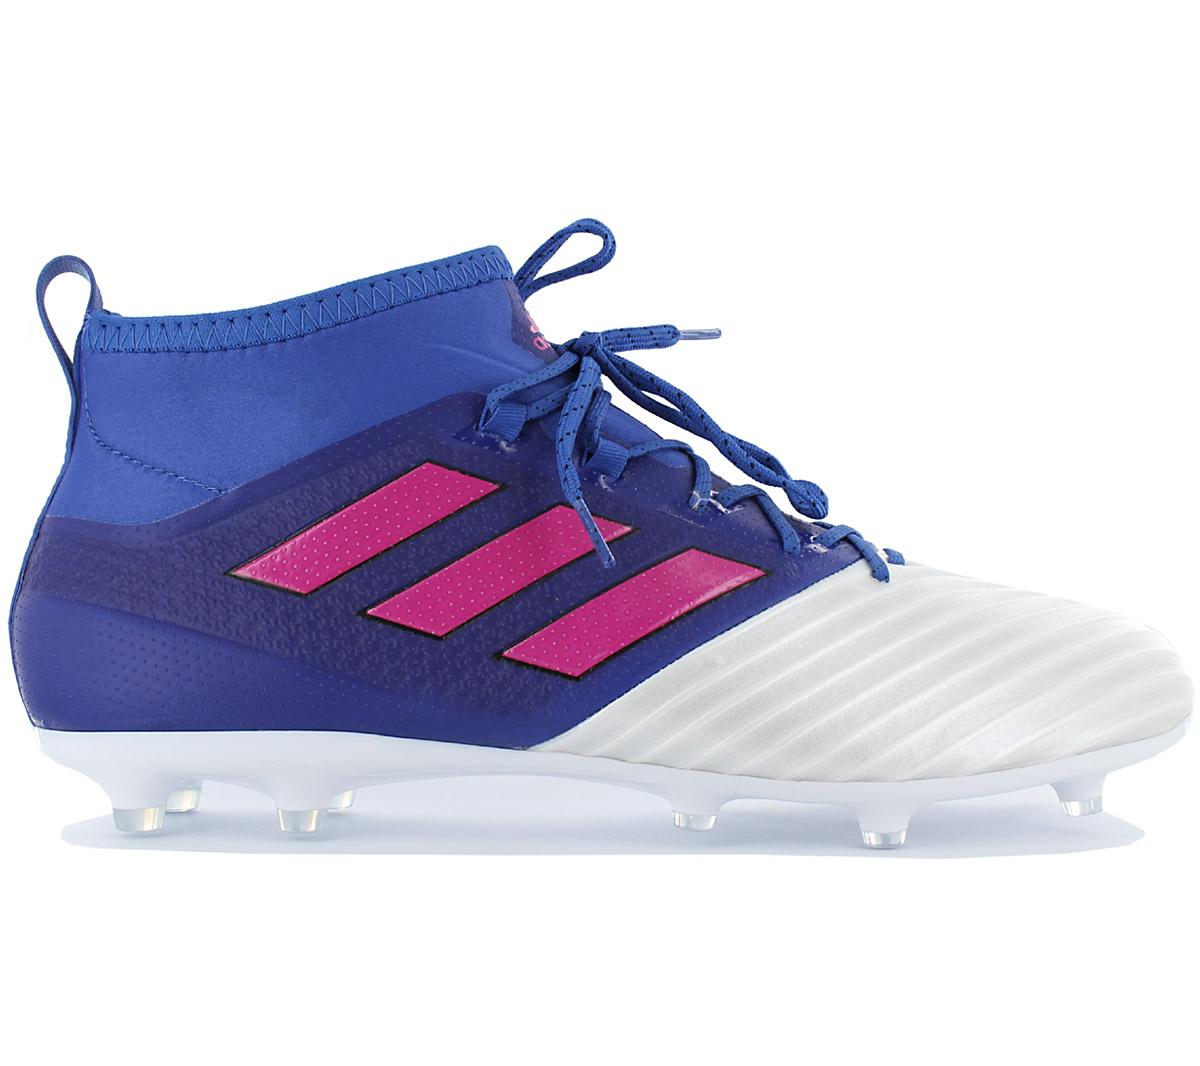 Adidas Ace 17.2 Primemesh Fg Men s Football Boots Blue Studs New ... ef1793760f6f